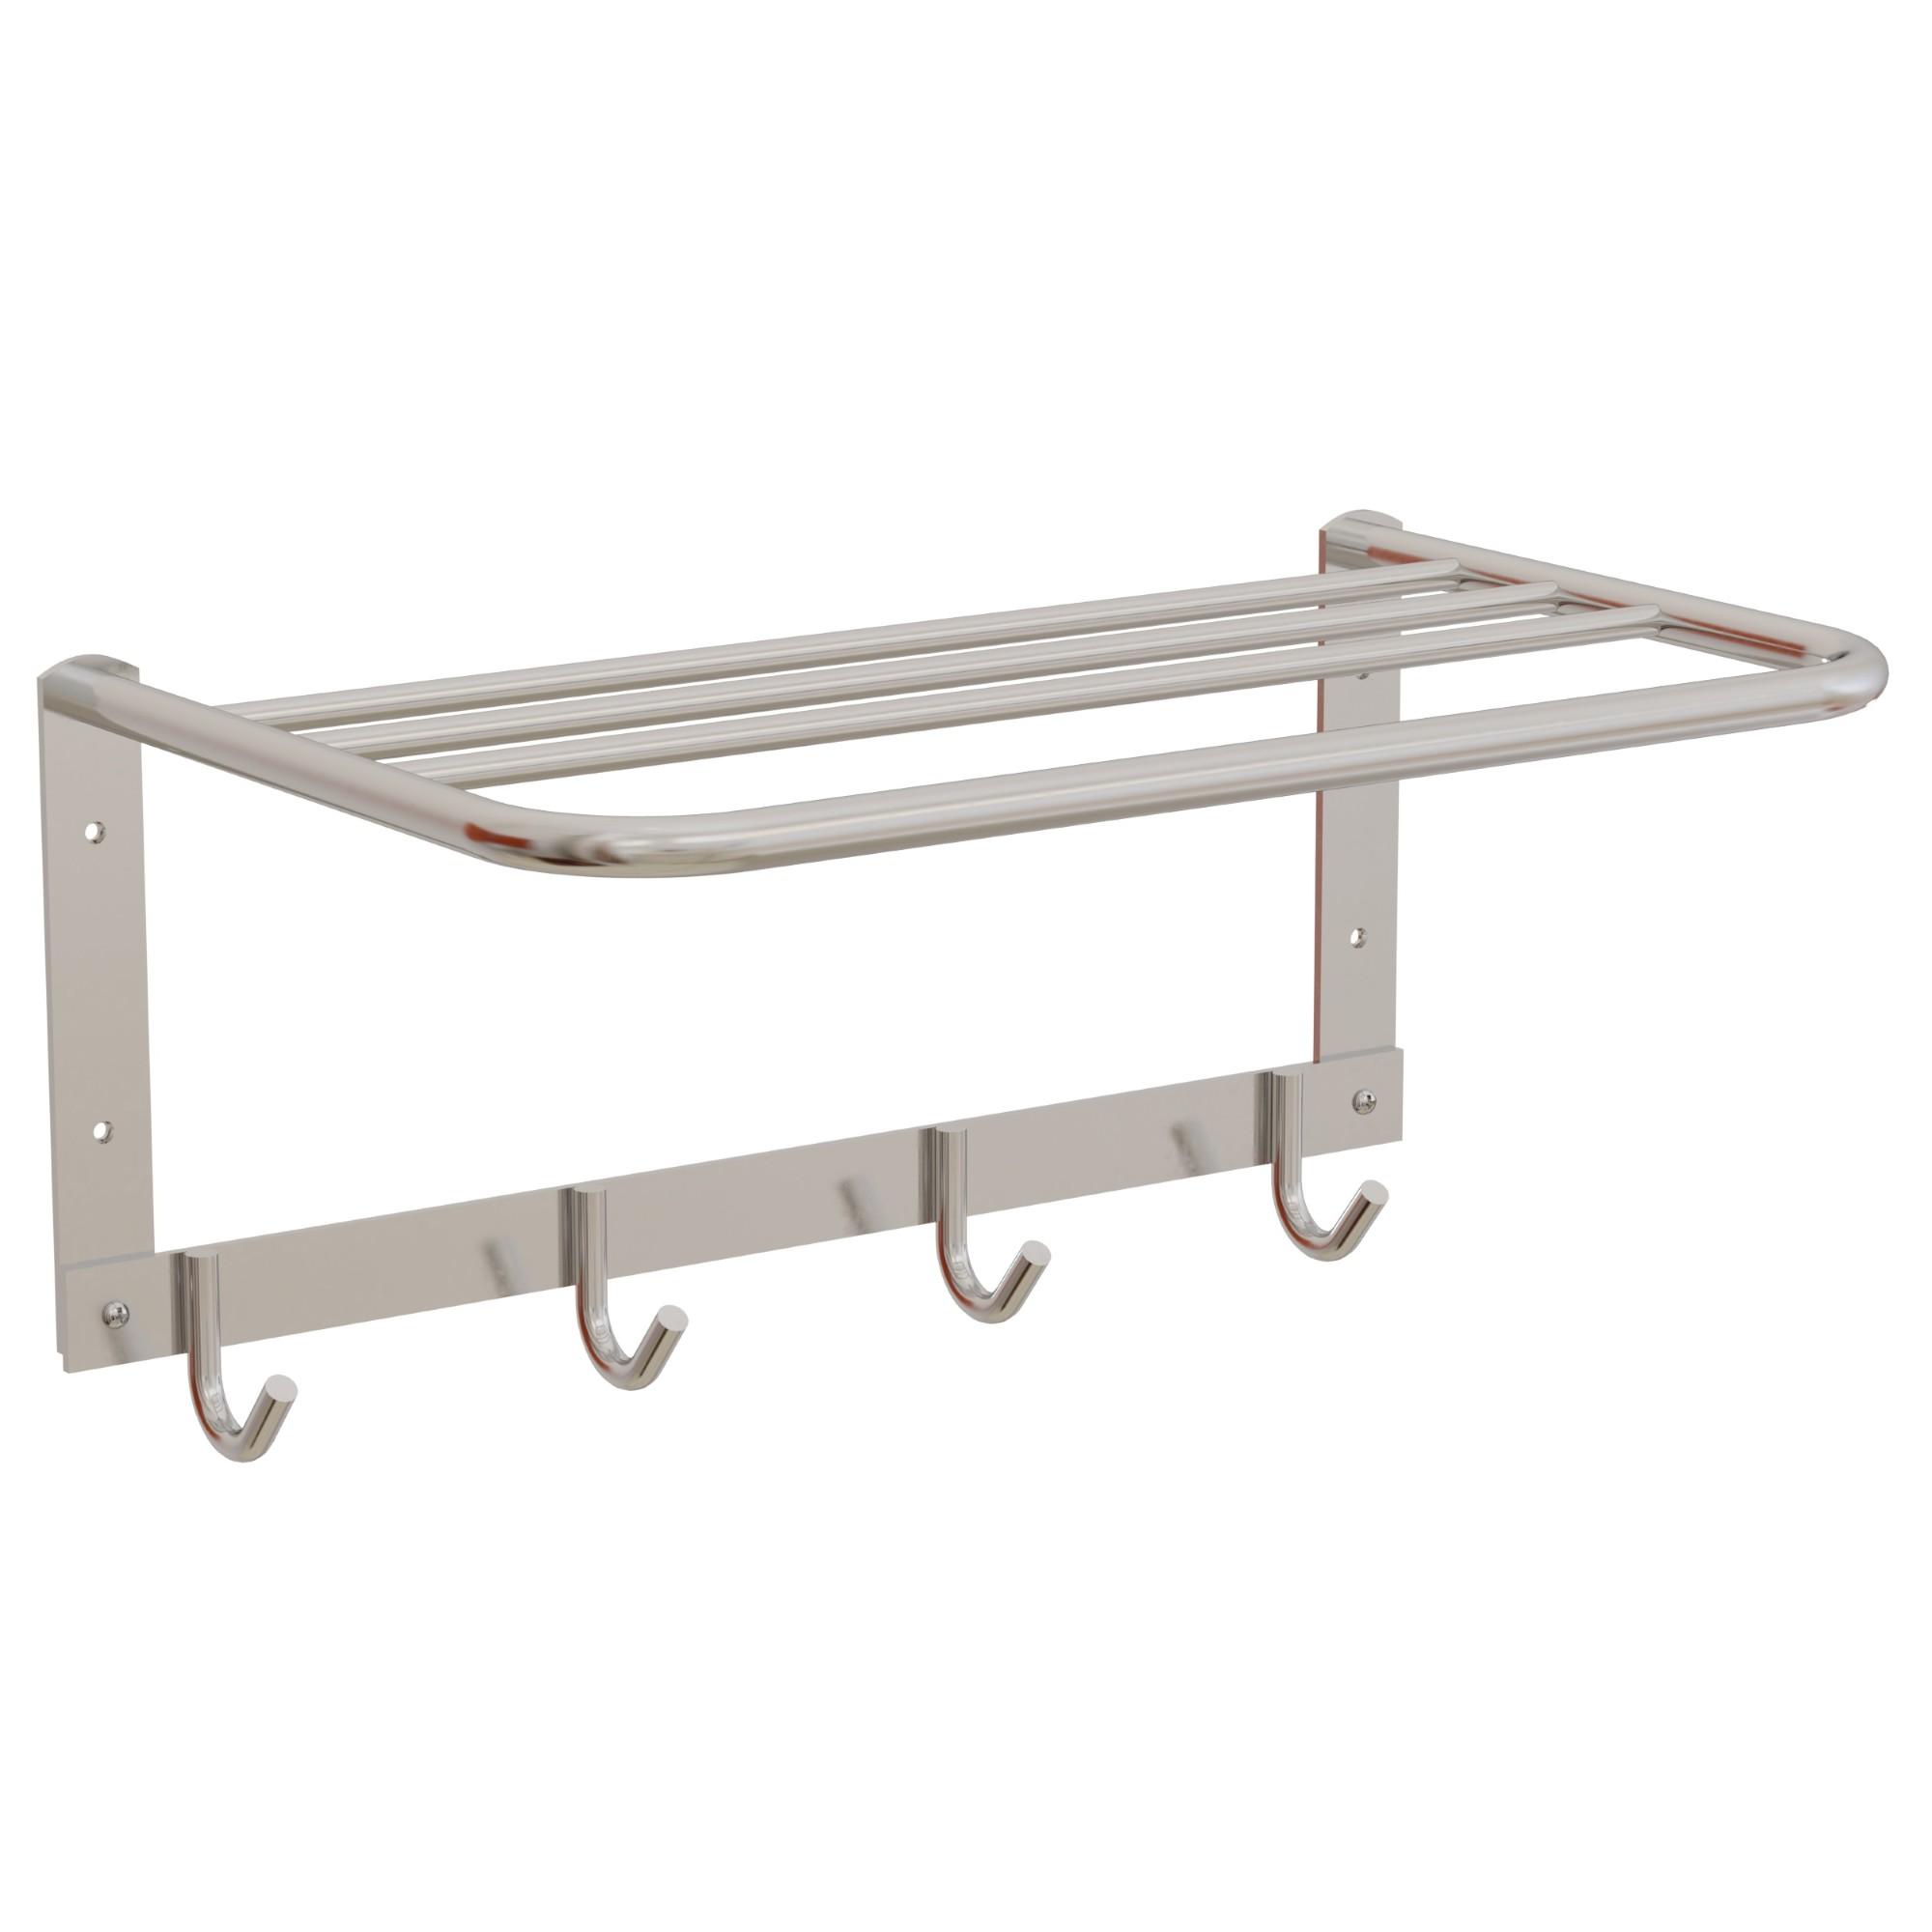 Porta Toalha Suporte de Aluminio 4 Cabides - Sicmol